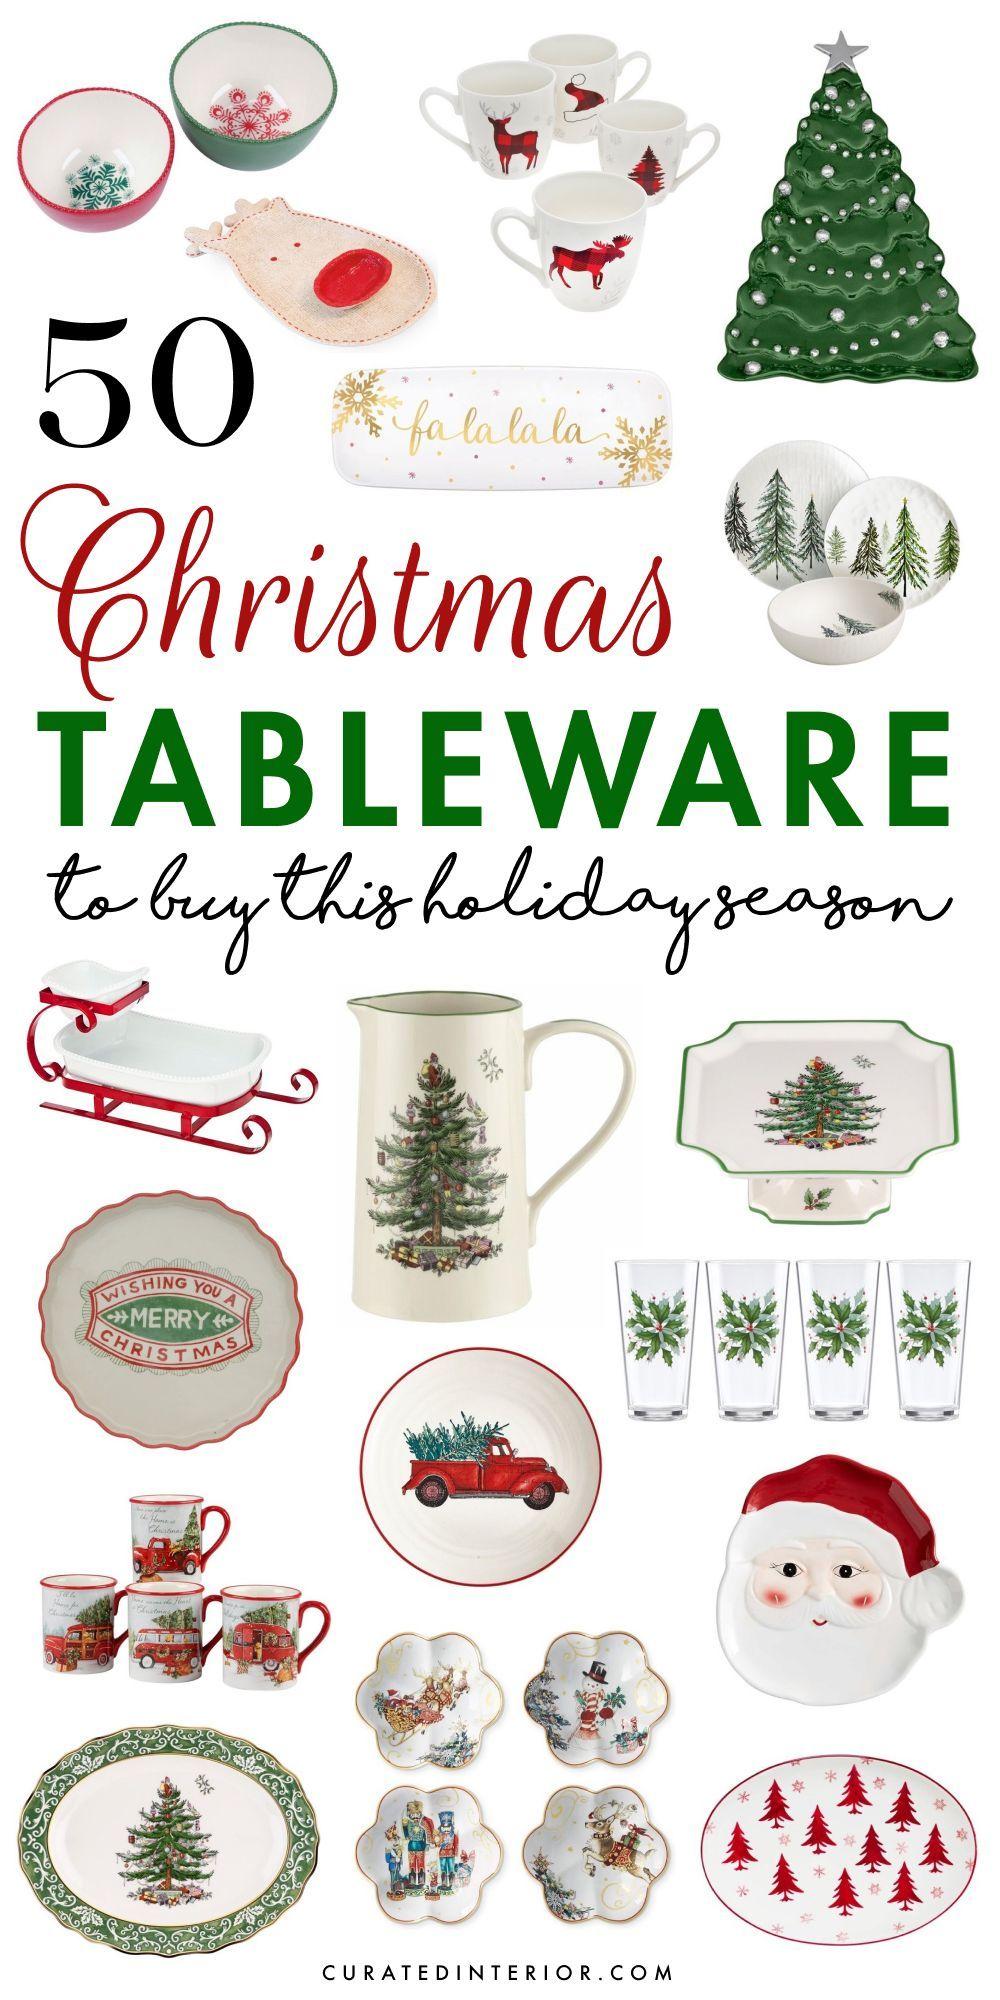 50 Christmas Tableware